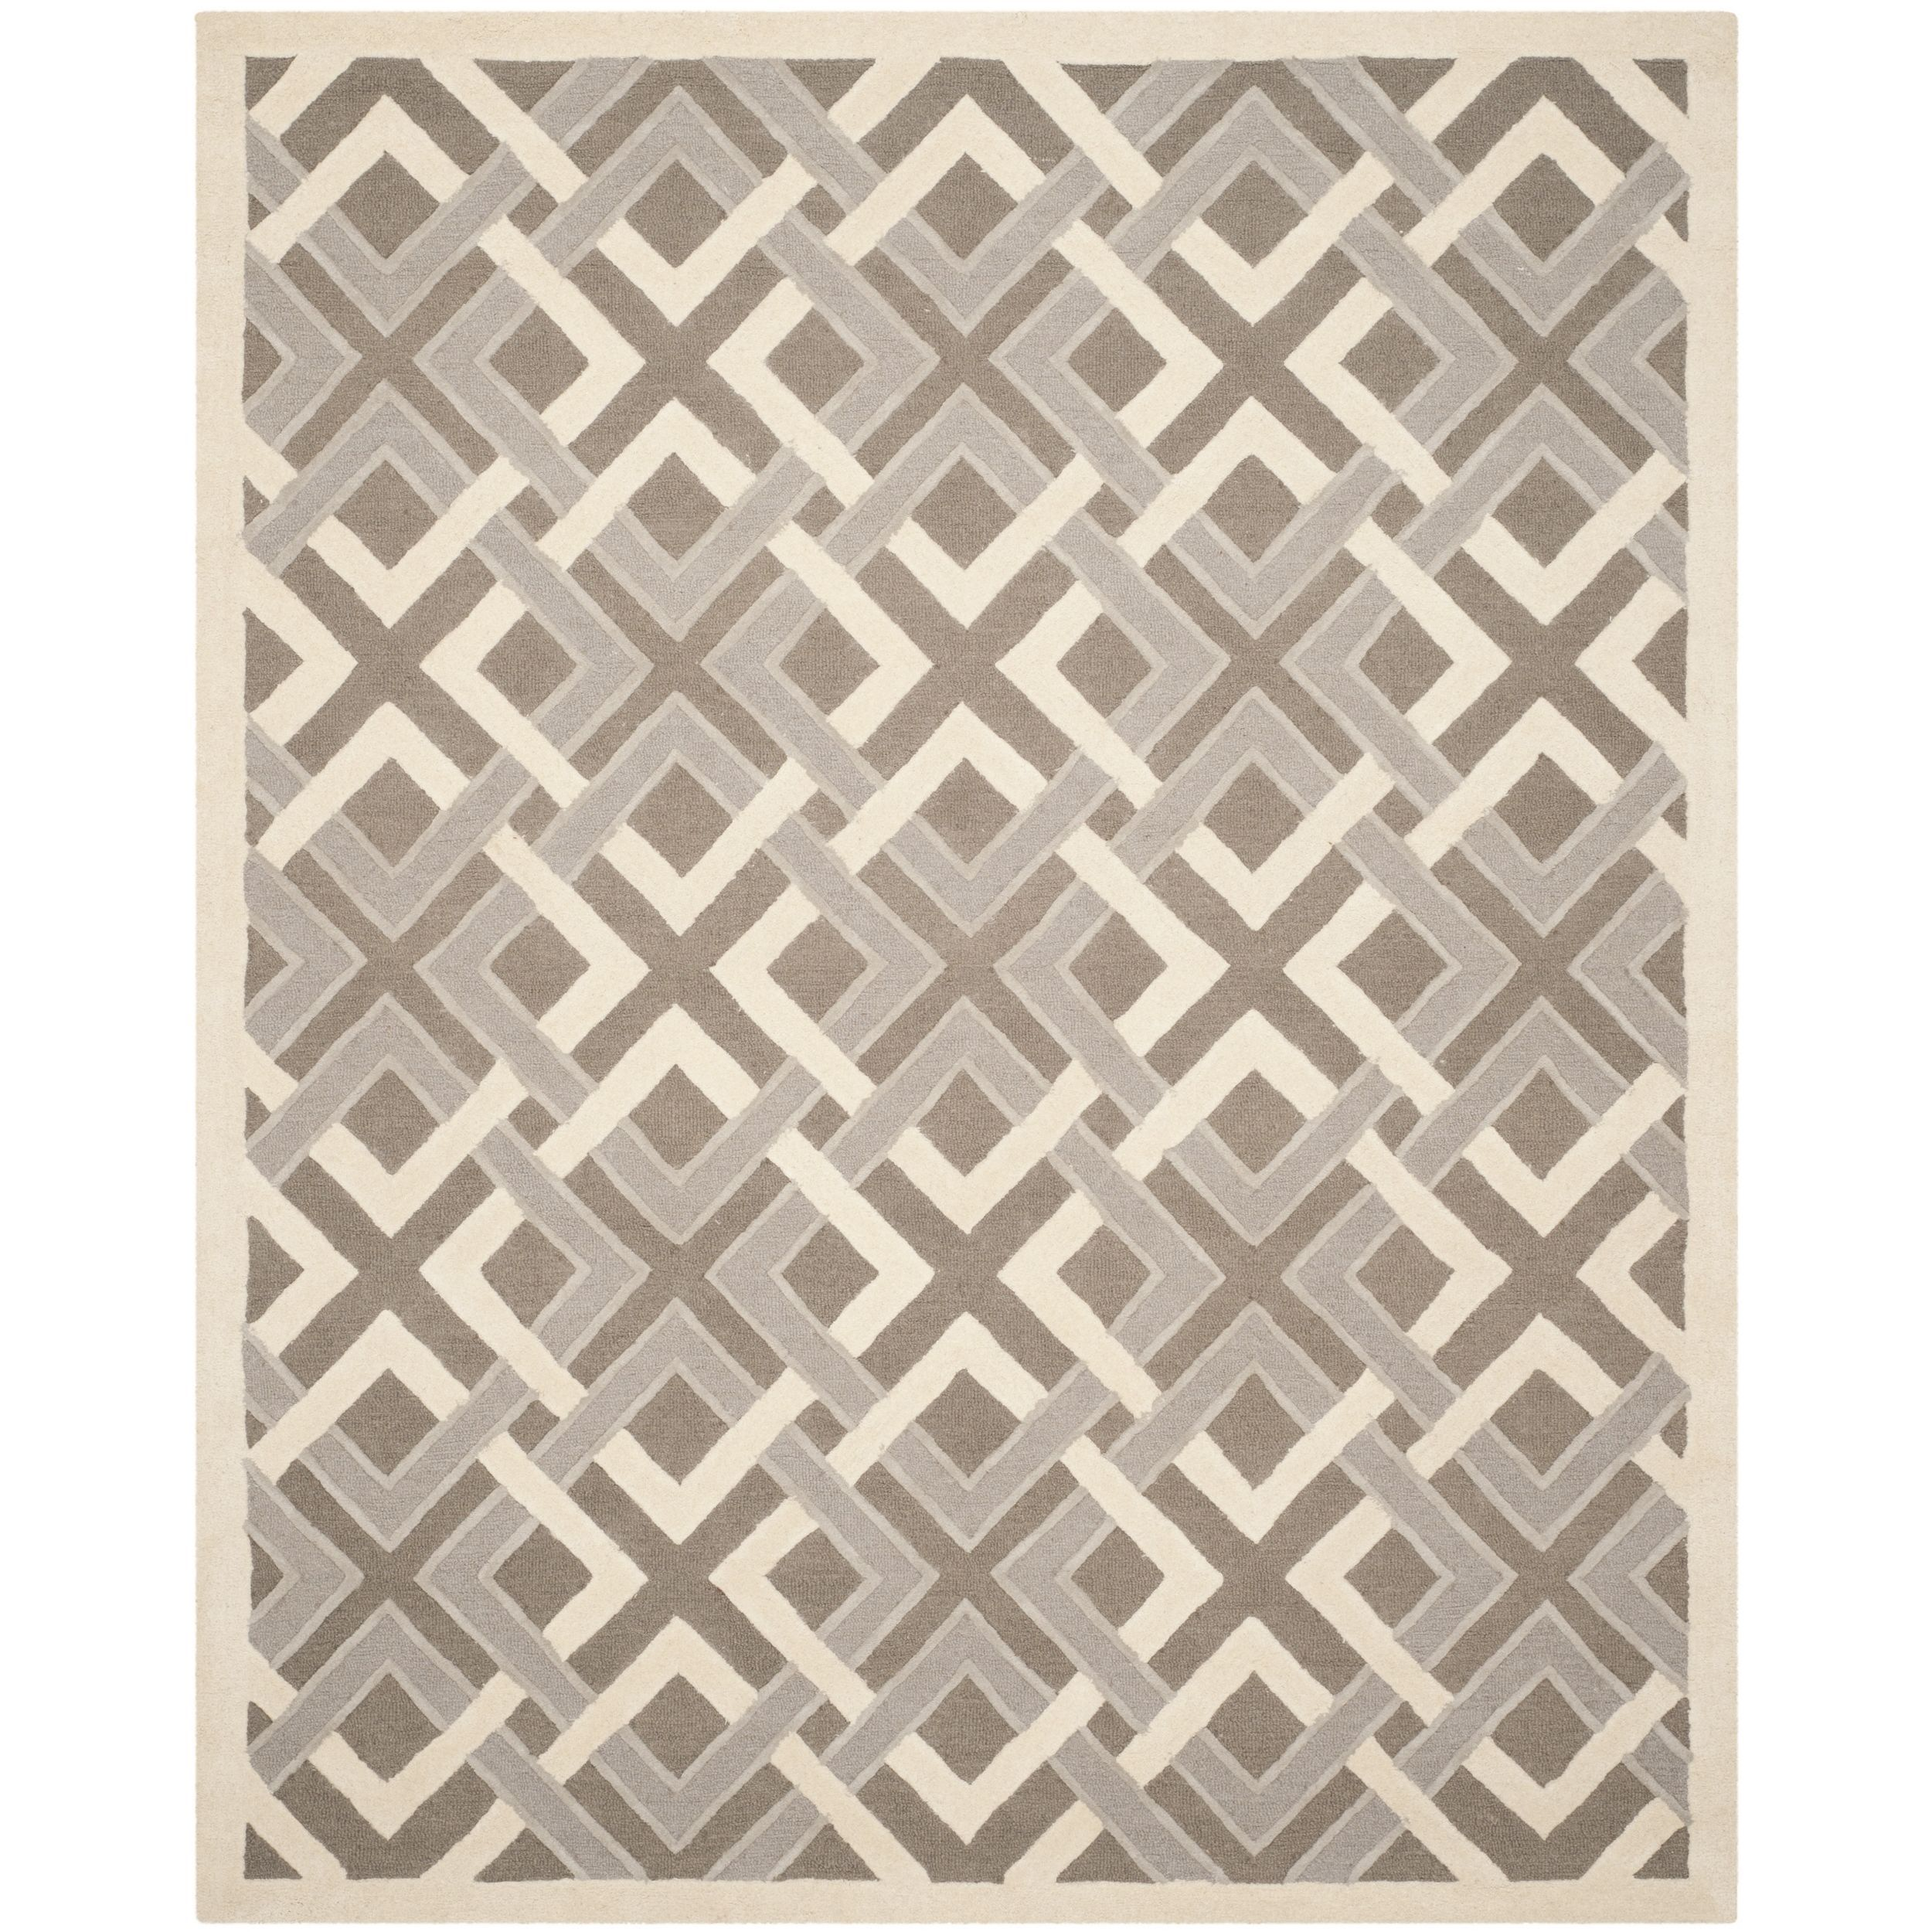 Martha Stewart By Safavieh Woven Lattice Taupe Ivory Wool Rug 8